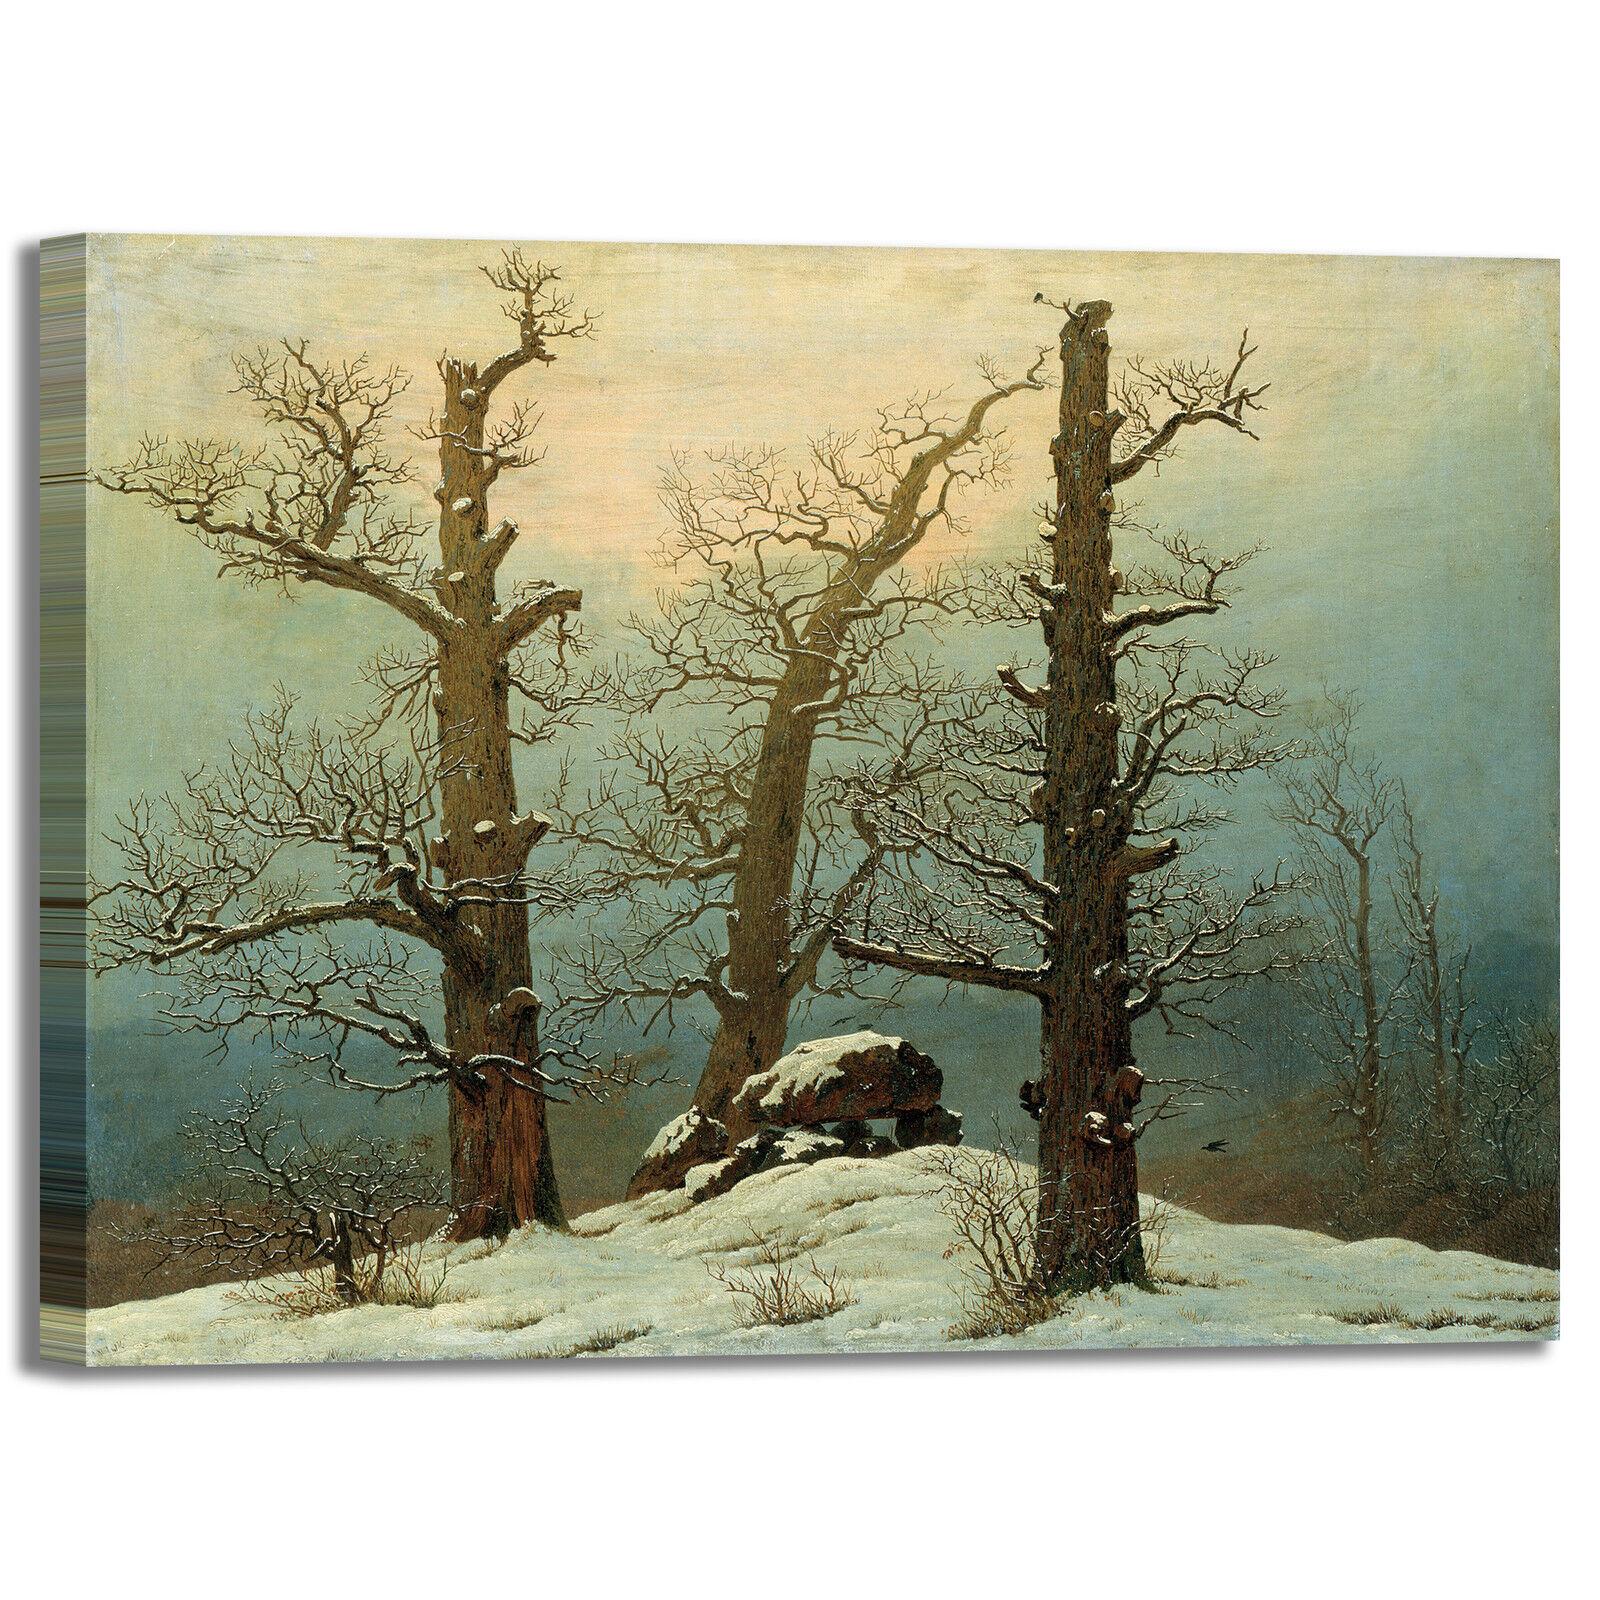 Caspar tumulo di neve design quadro stampa tela dipinto telaio arroto casa